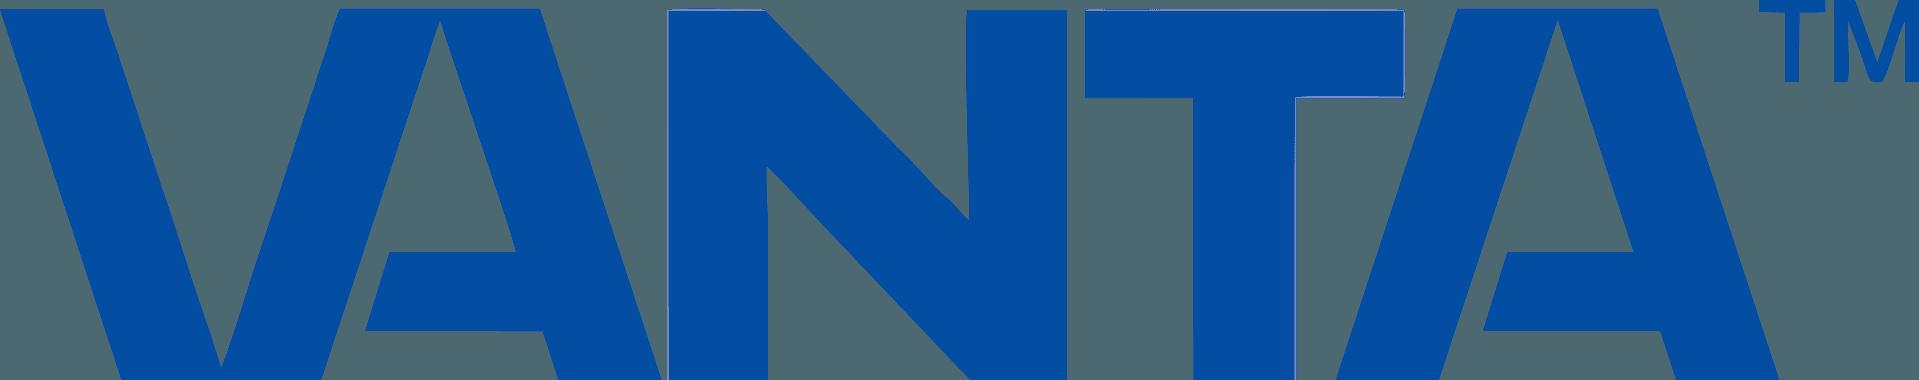 VANTA Logo | Innov X Africa - XRF Analyzers South Africa